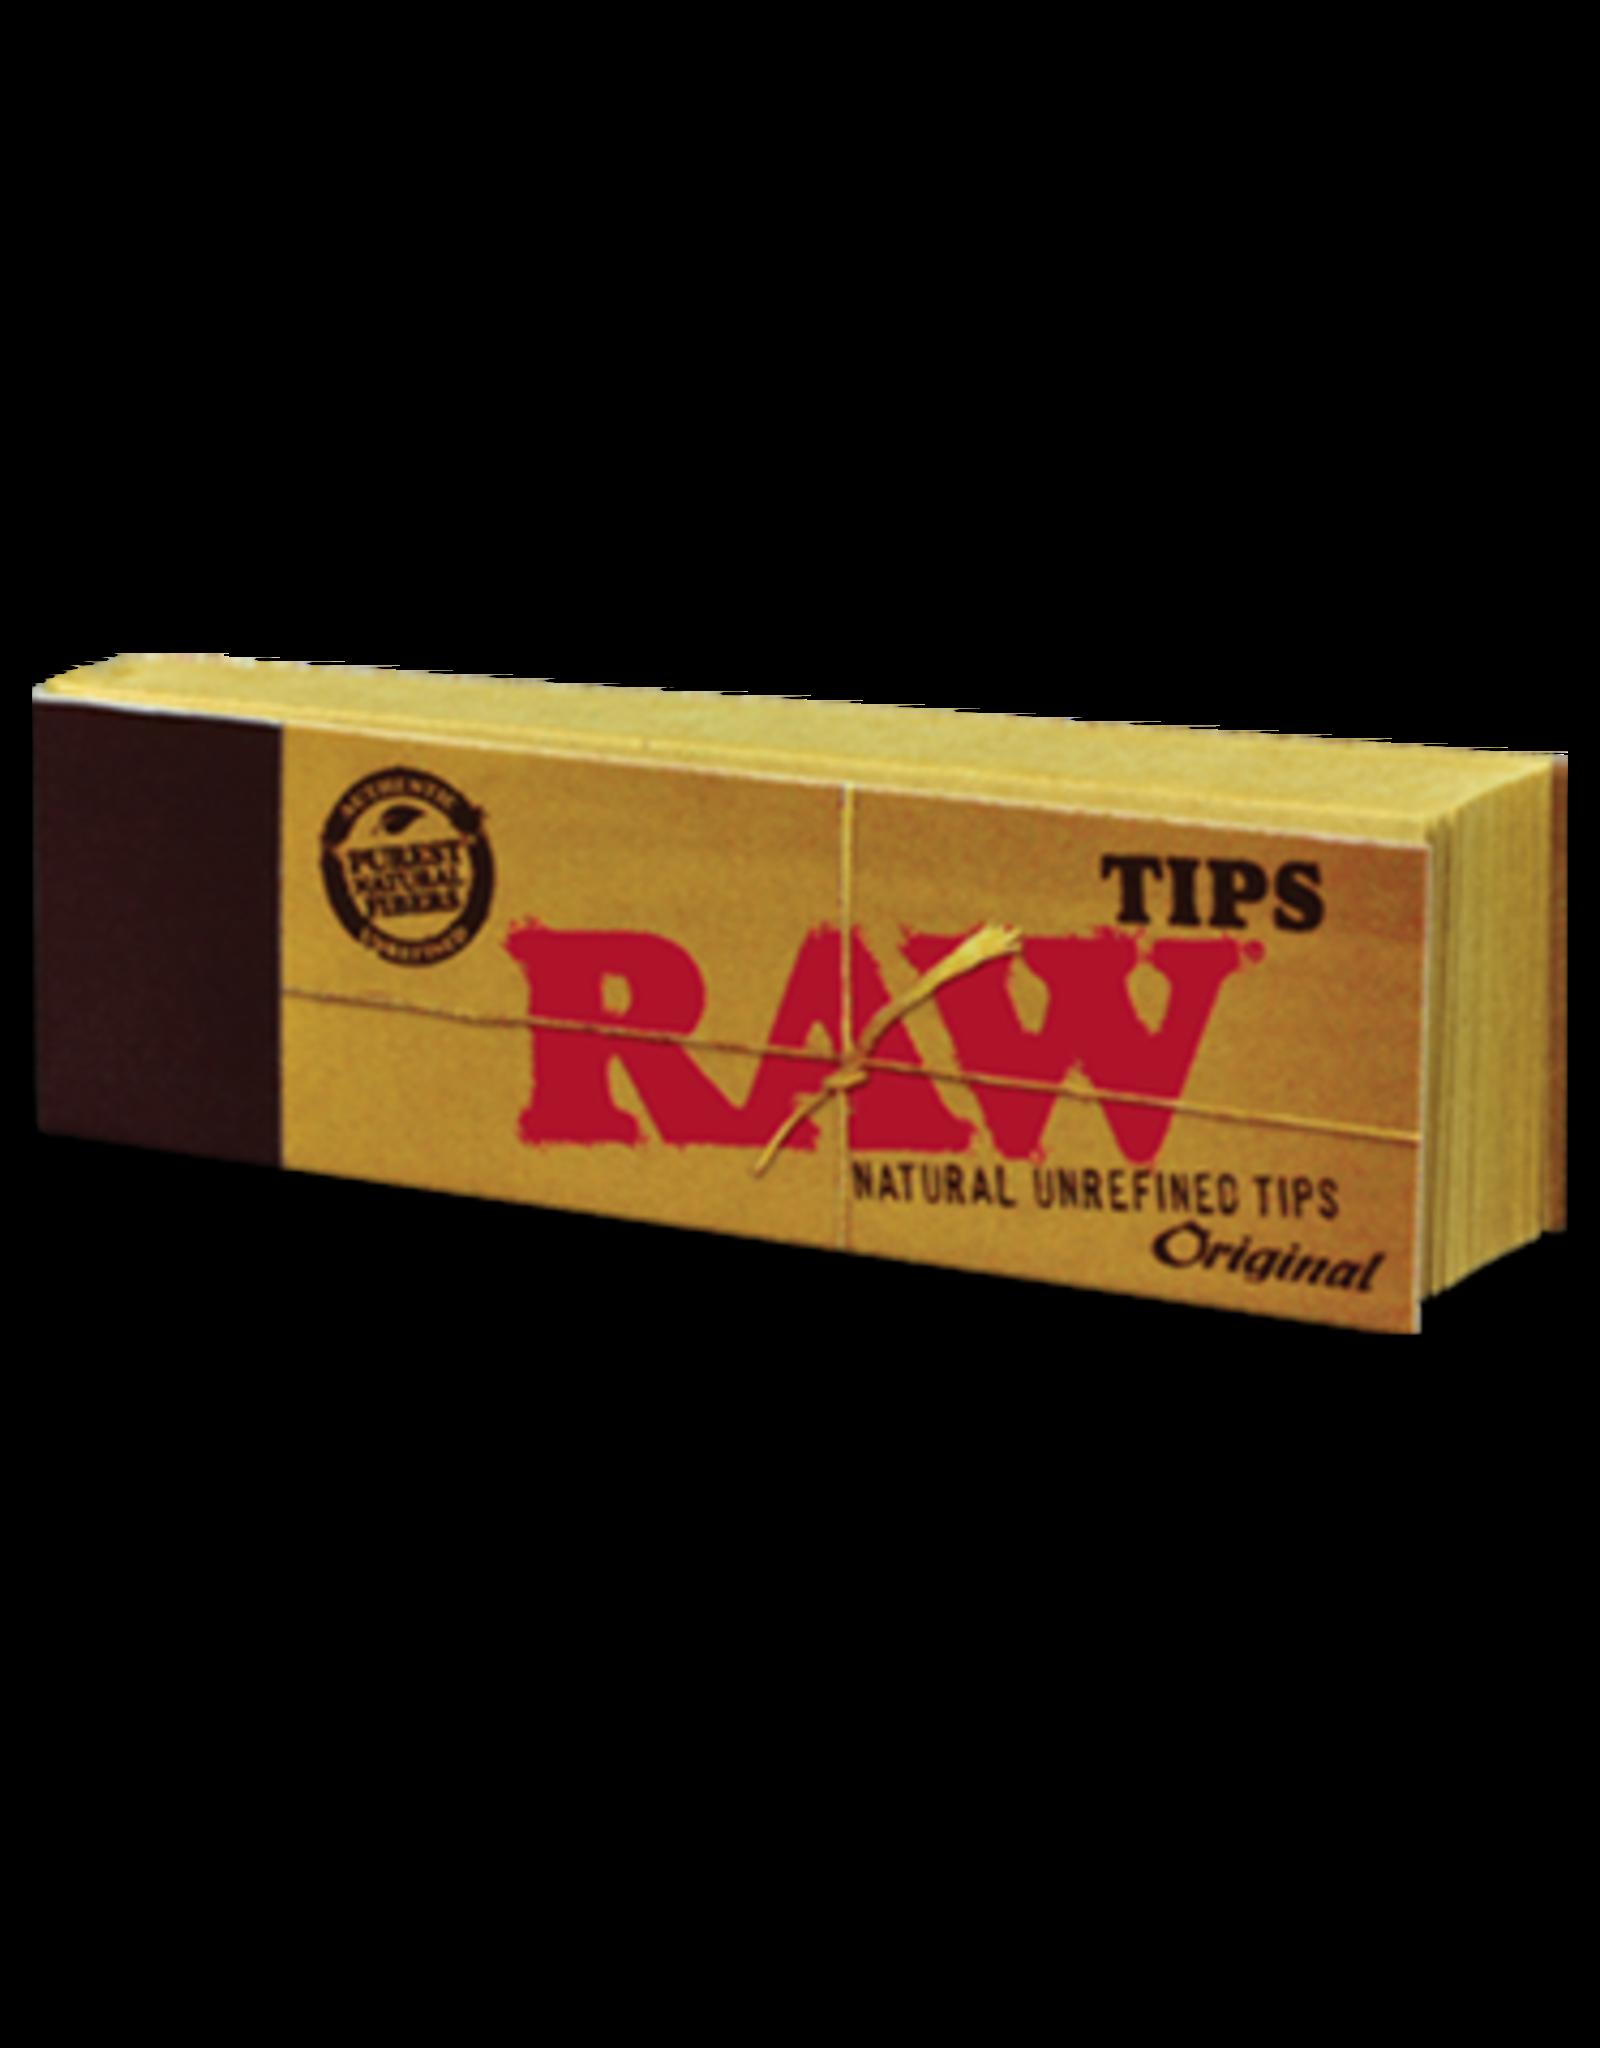 RAW RAW Natural Unrefined Original Tips